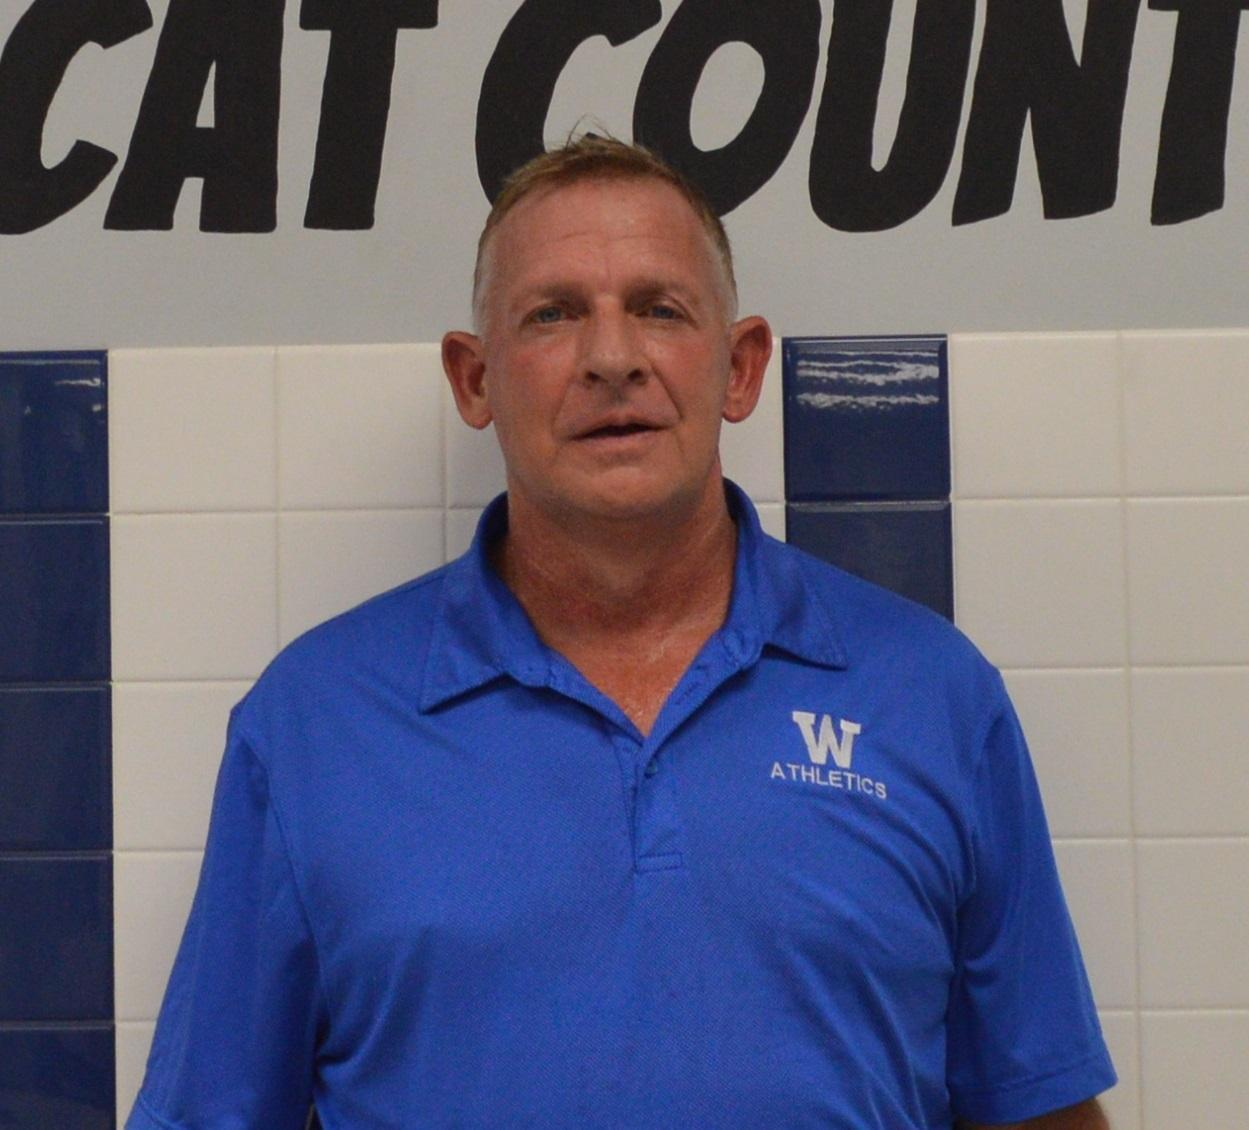 Coach King